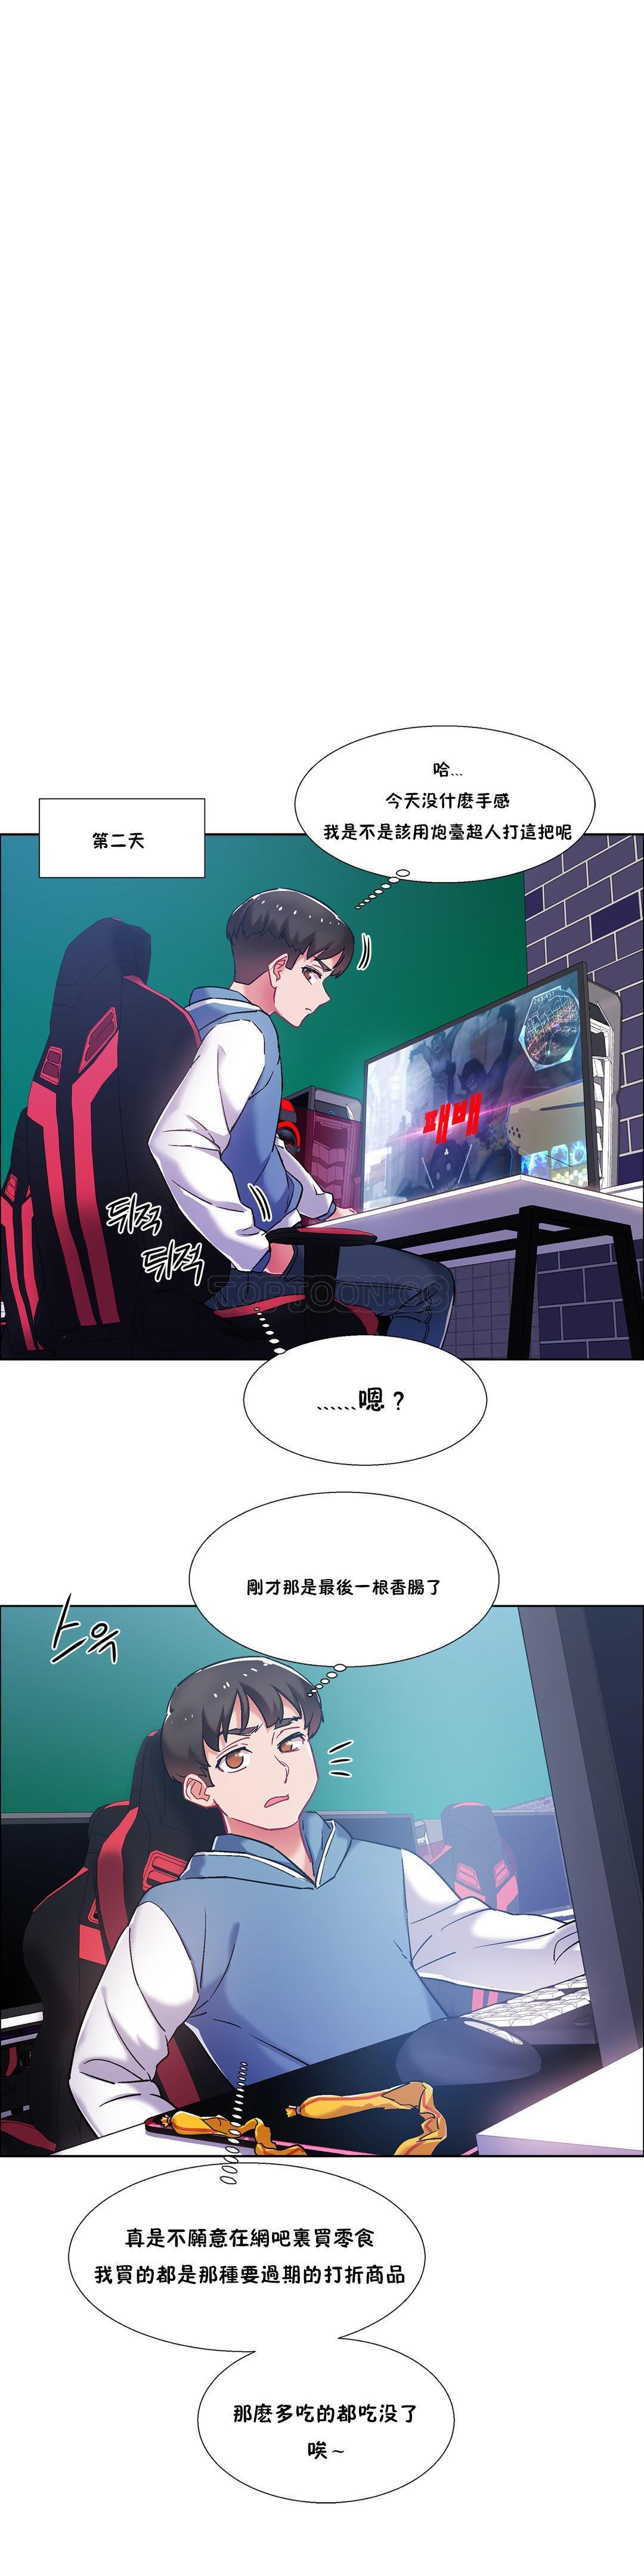 [Studio Wannabe] Rental Girls | 出租女郎 Ch. 33-58 [Chinese]  第二季 完结 80